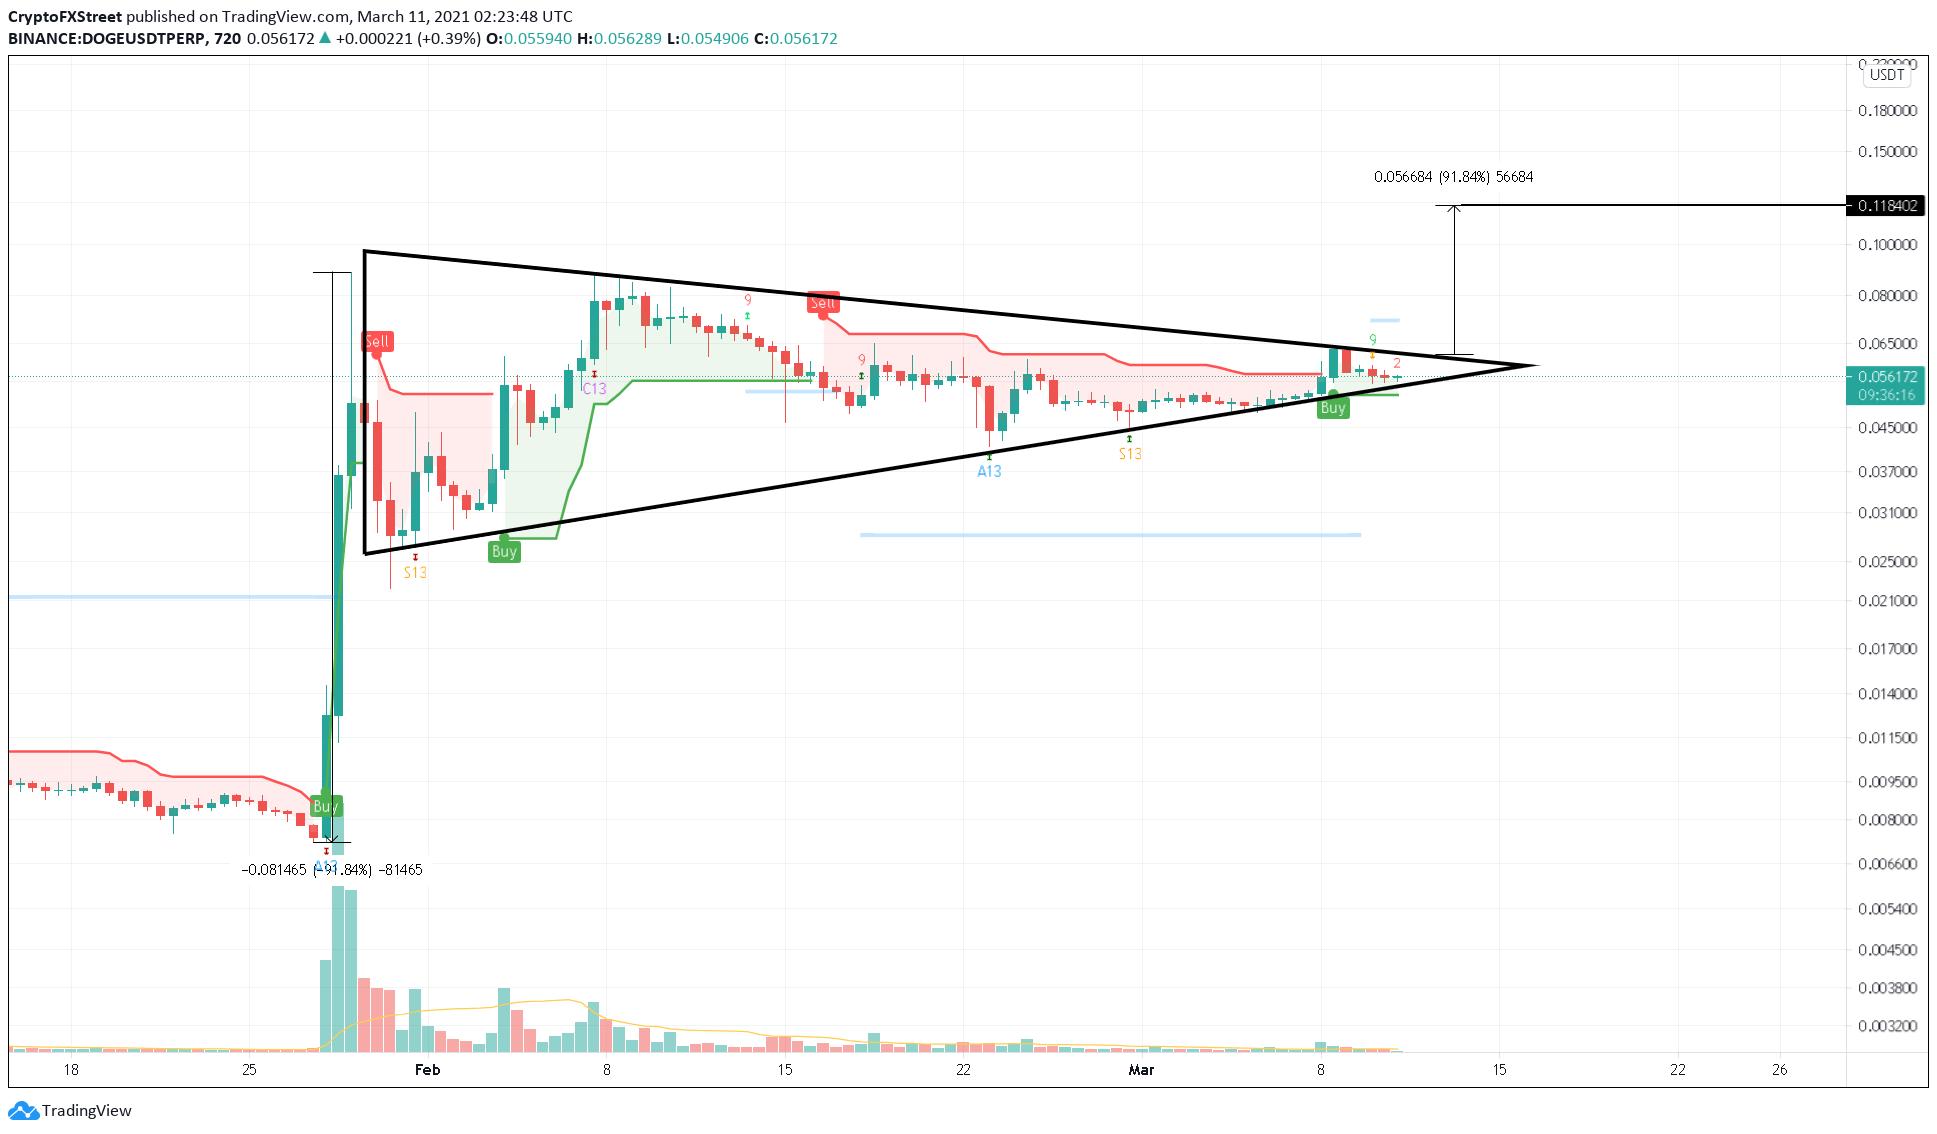 DOGE/USDT 12-hour chart